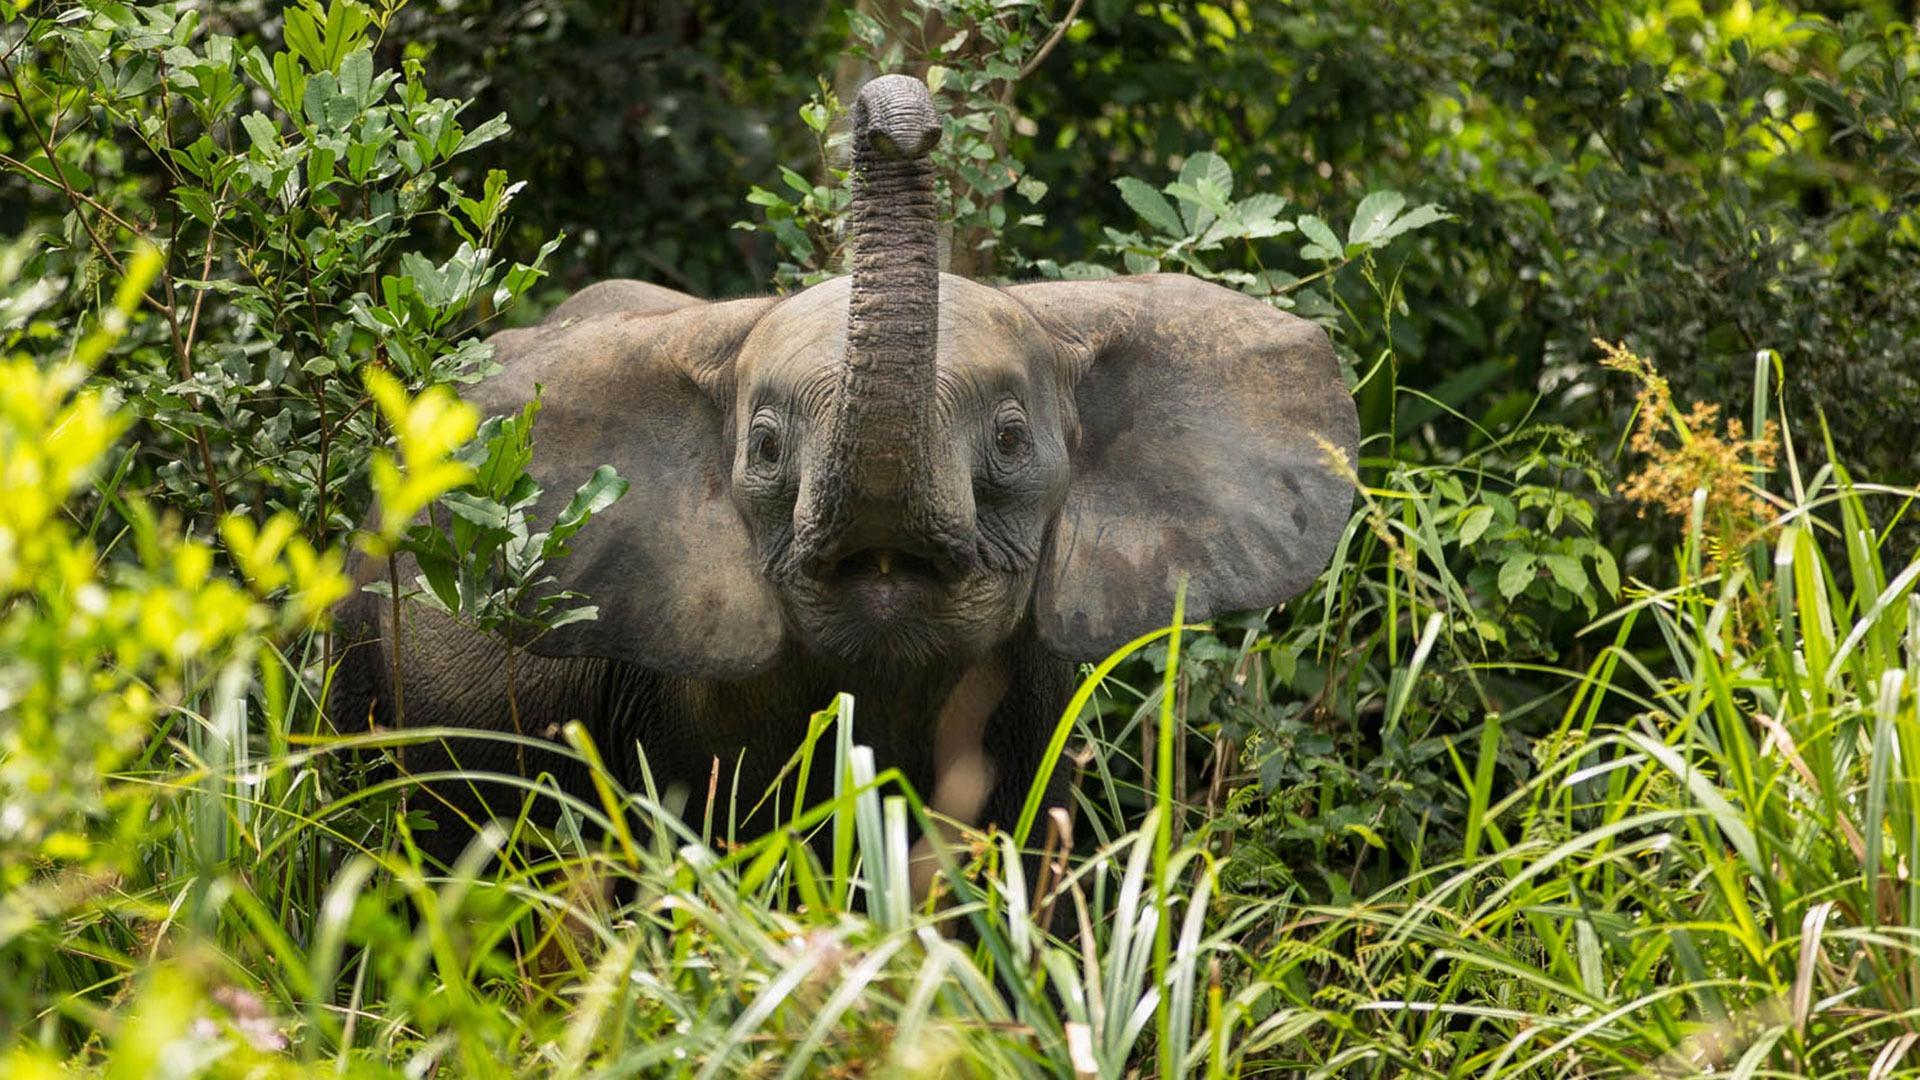 Forest elephant calf, Odzala-Kokoua National Park, Congo